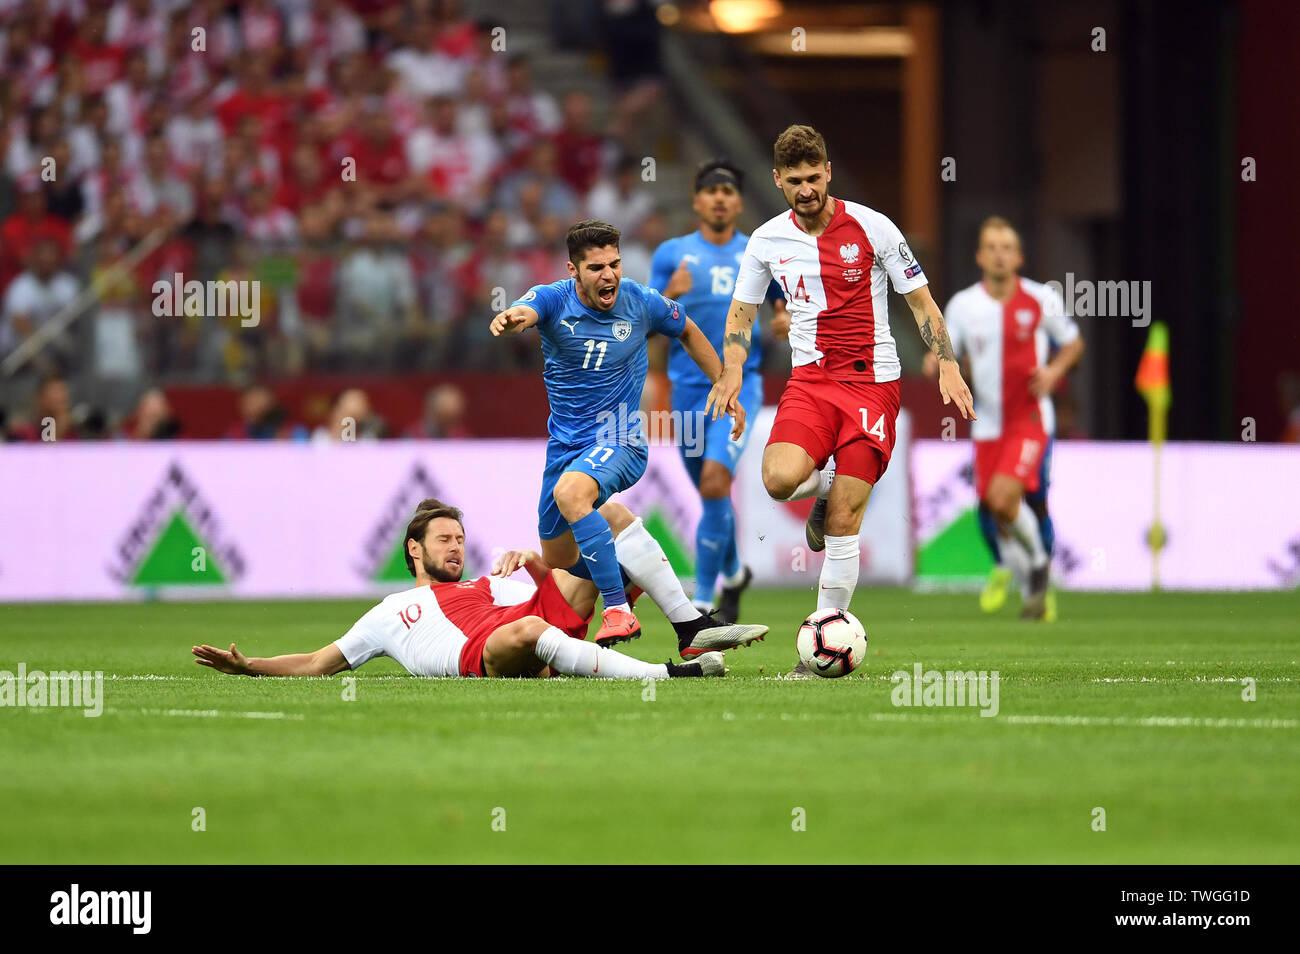 Warsaw, Poland, June 10, 2019: EURO 2020 qualifing round, group stage, Poland wins 4:0 with Izarel on PGE Narodowy. Grzegorz Krychowiak (Poland) Manor Solomon (Izrael) Mateusz Klich (Poland) - Stock Image